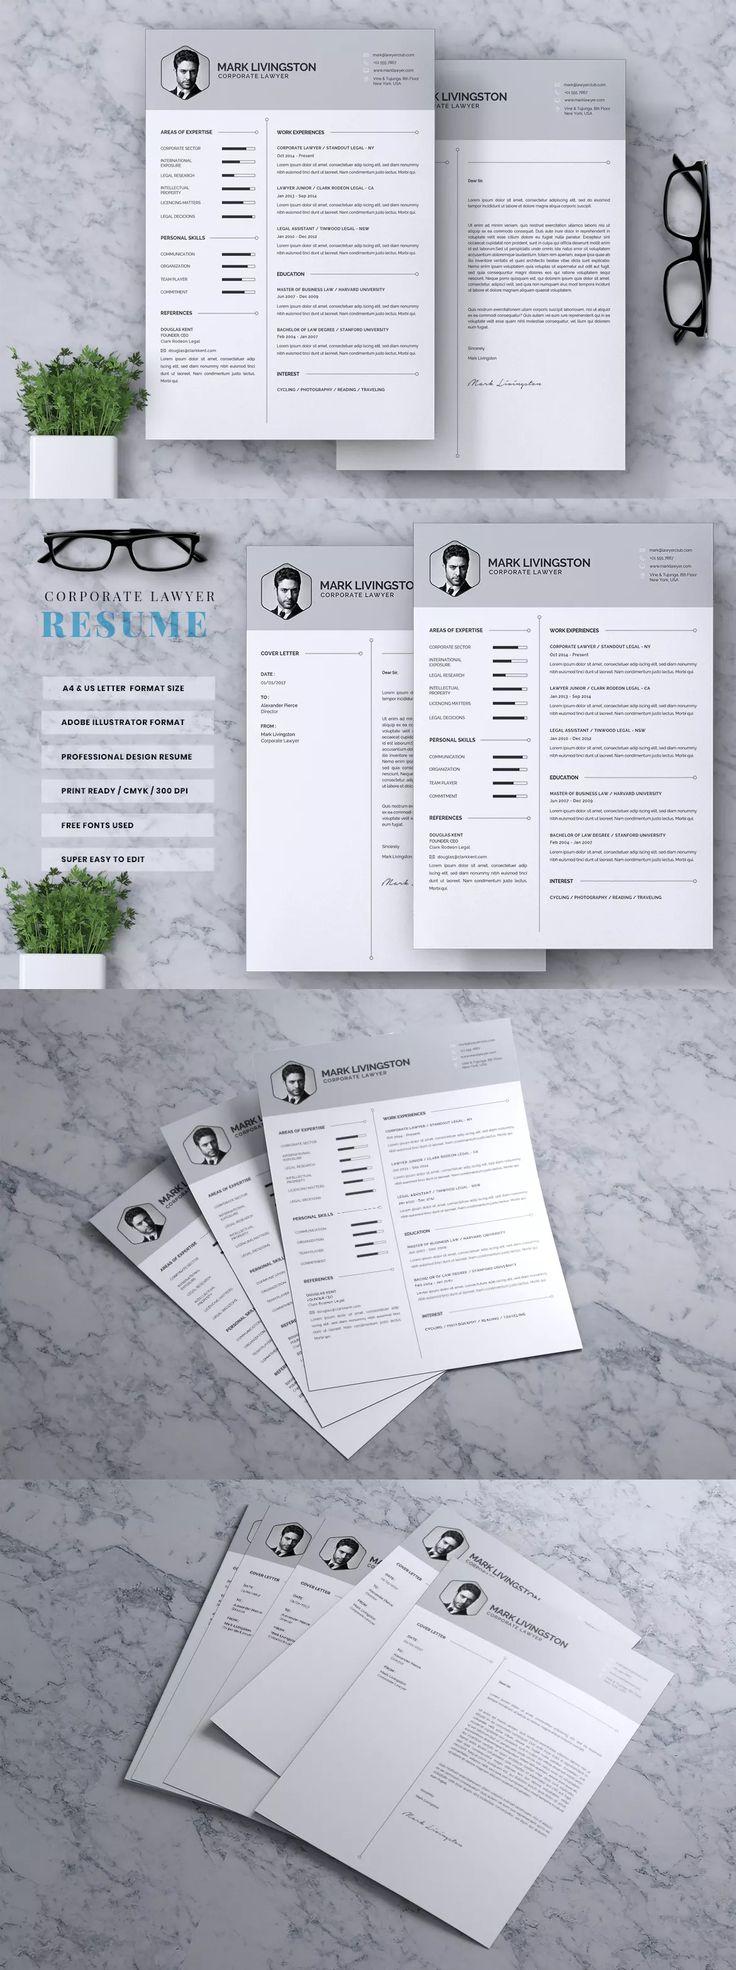 Corporate lawyer cv resume by rahardicreative on cv